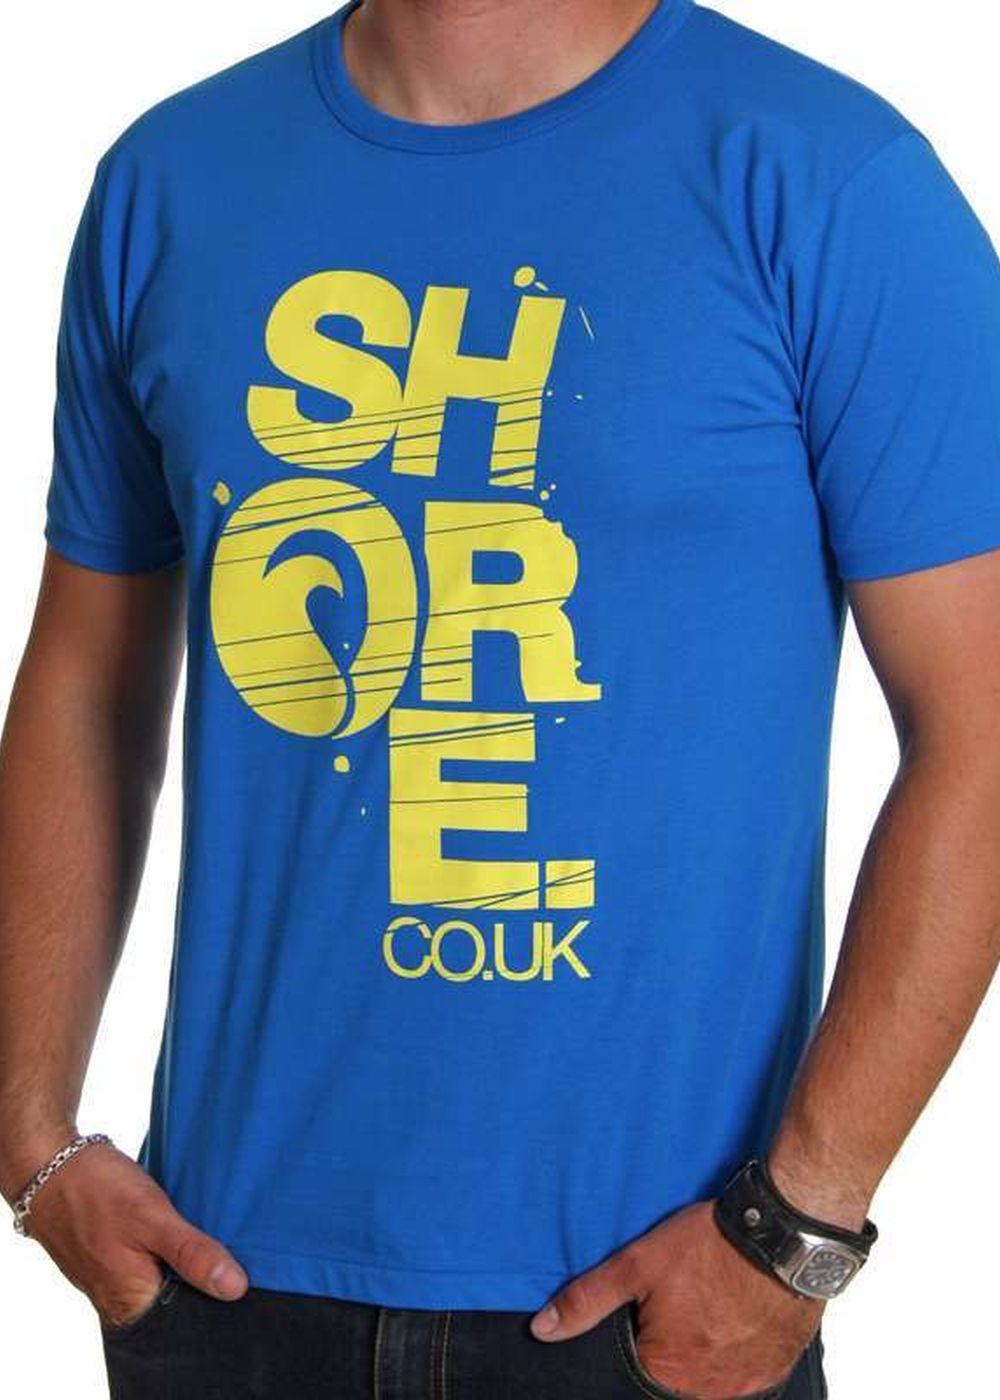 shore-tee-blueyellow